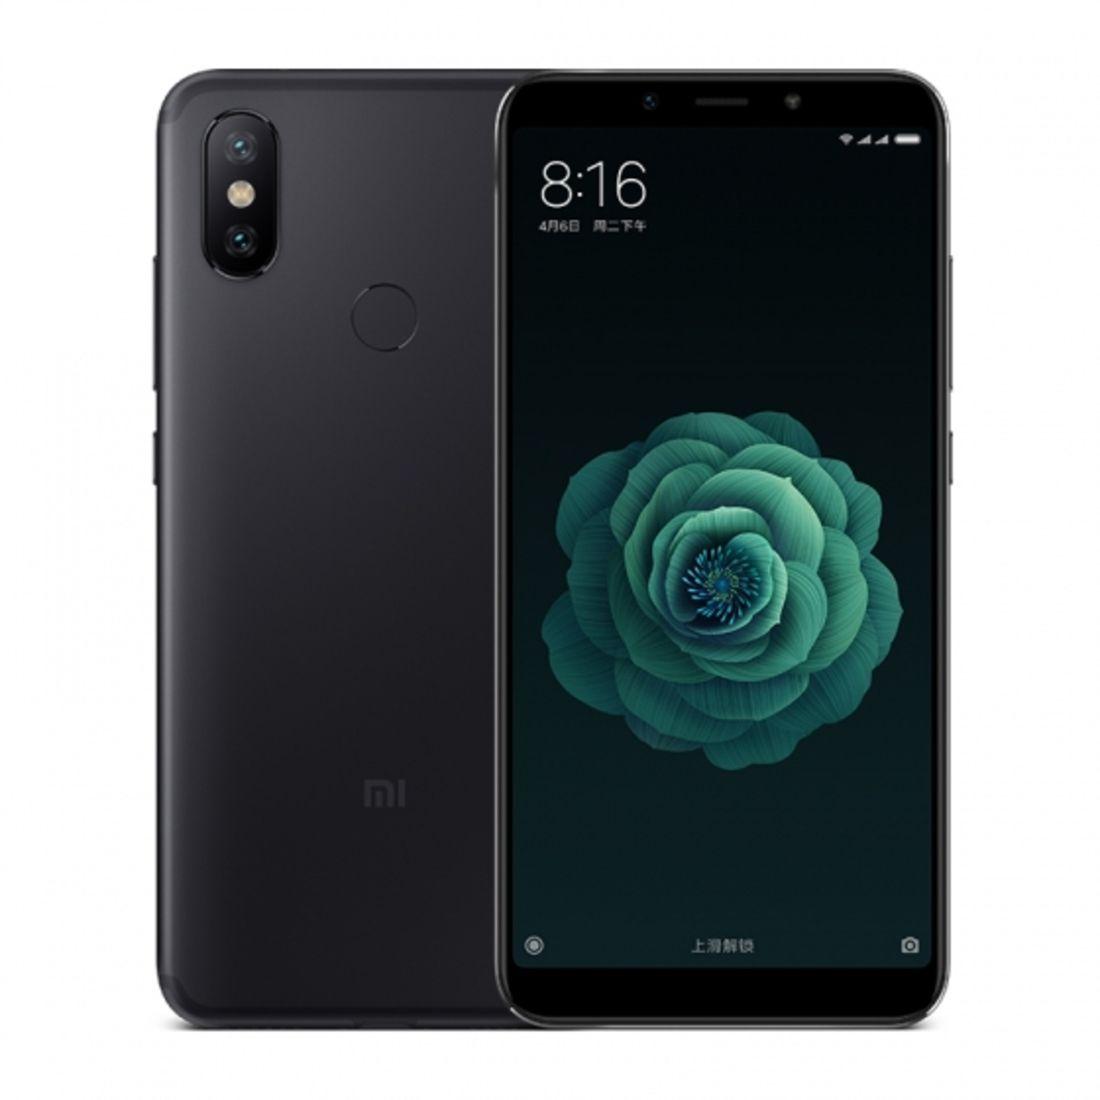 Smartphone Mi A2 4GB Ram Tela 5.99 64GB Camera Dupla 12+20MP - Preto